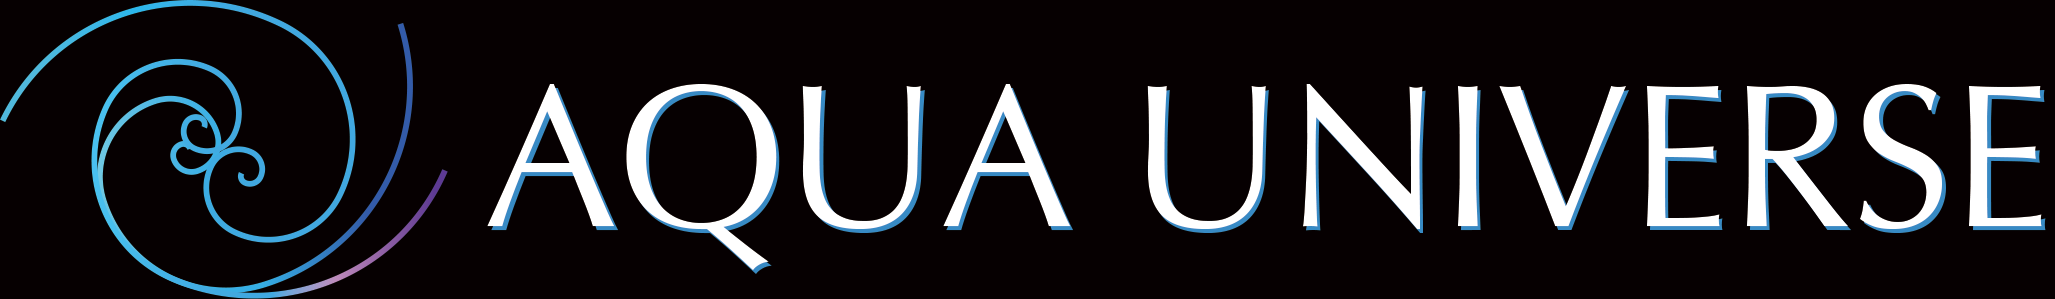 完AQUA-UNIVERSE-LOGO-2-Black-2016